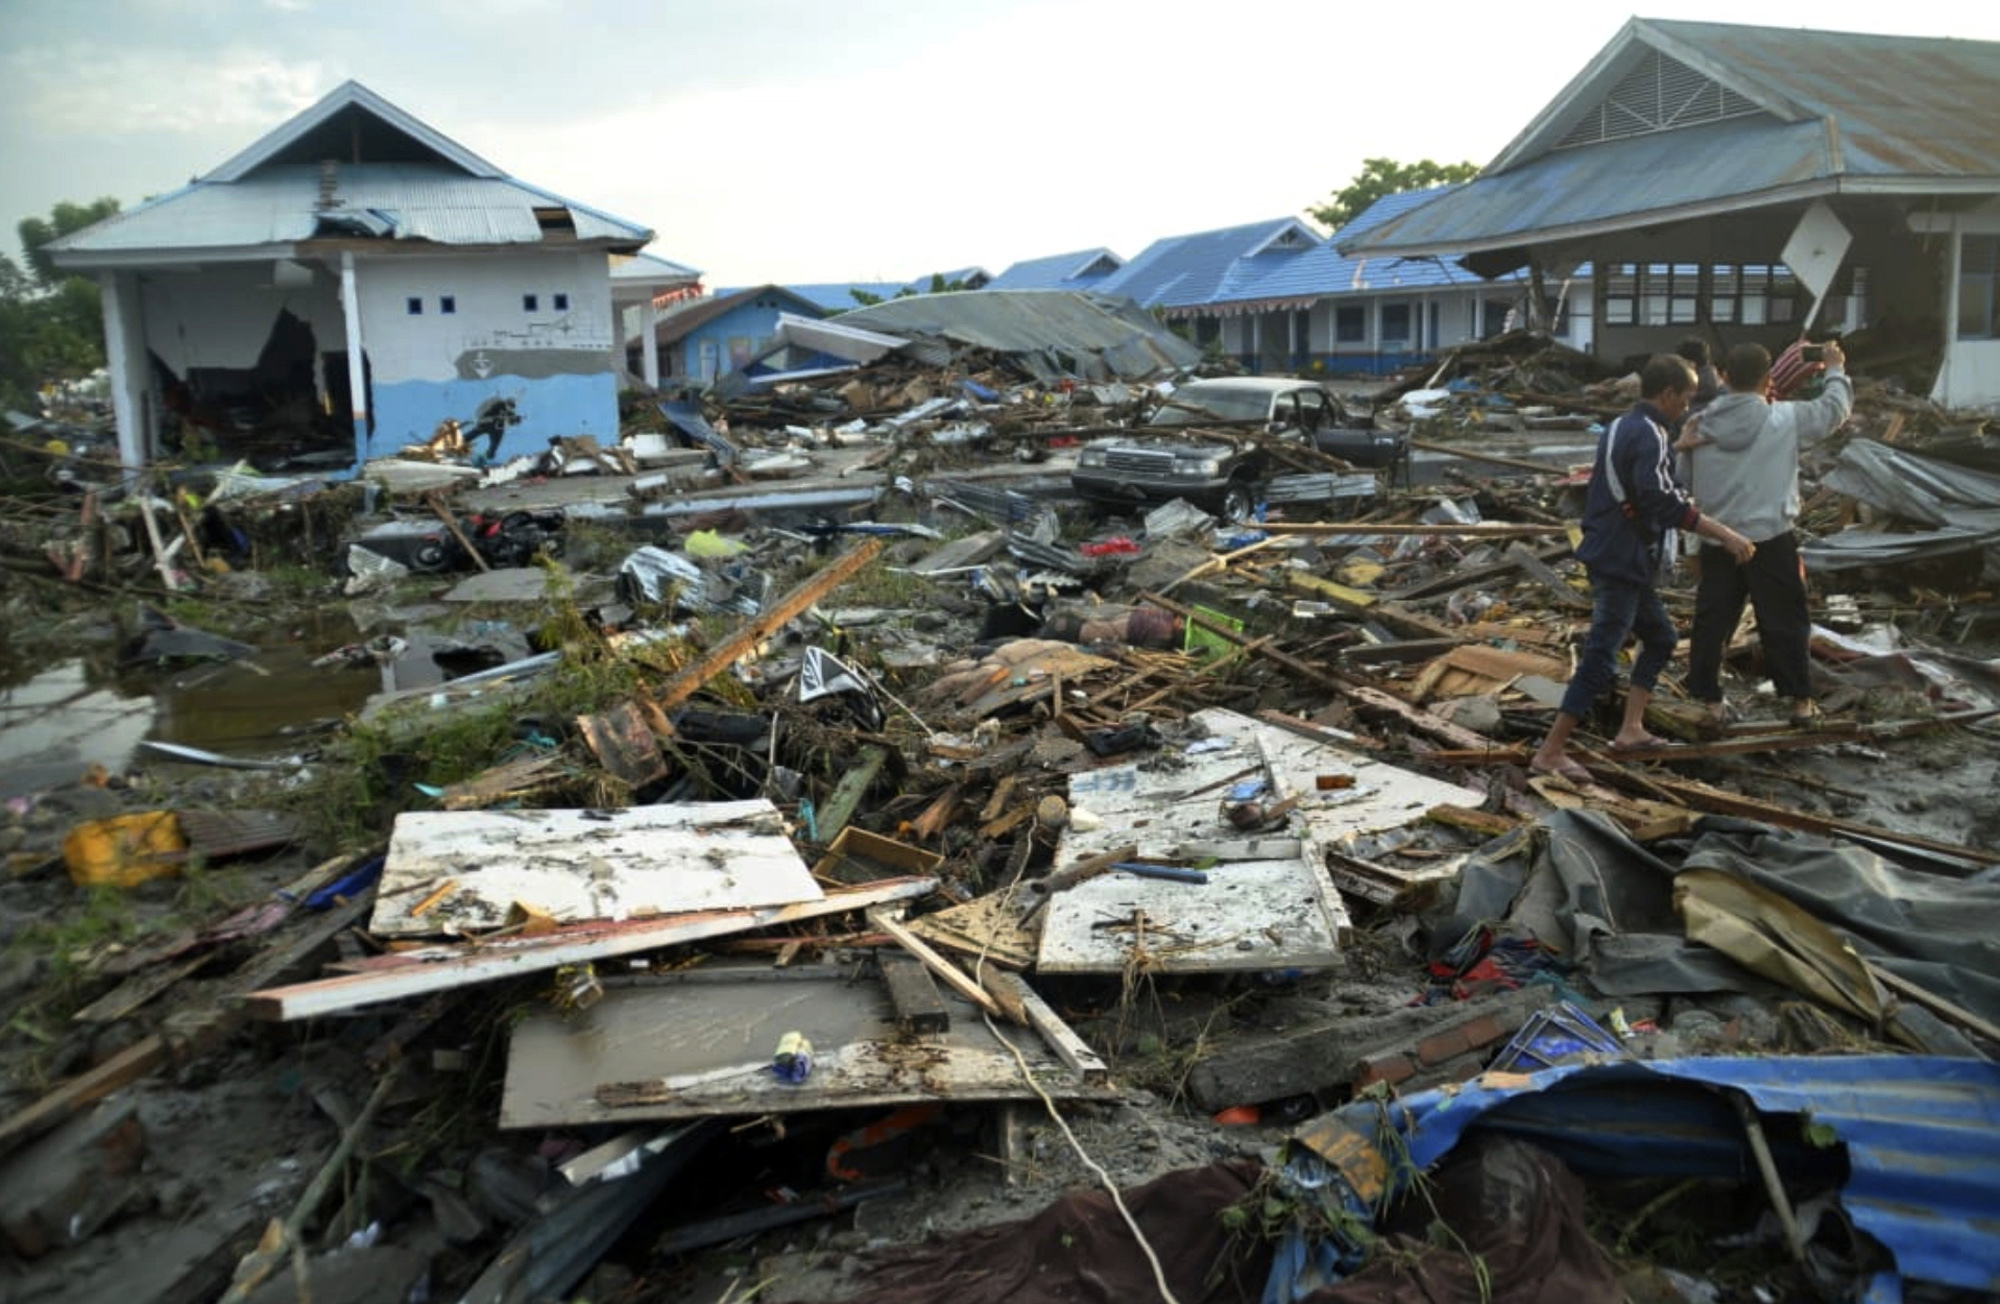 APTOPIX_Indonesia_Earthquake_82842-159532.jpg76770255